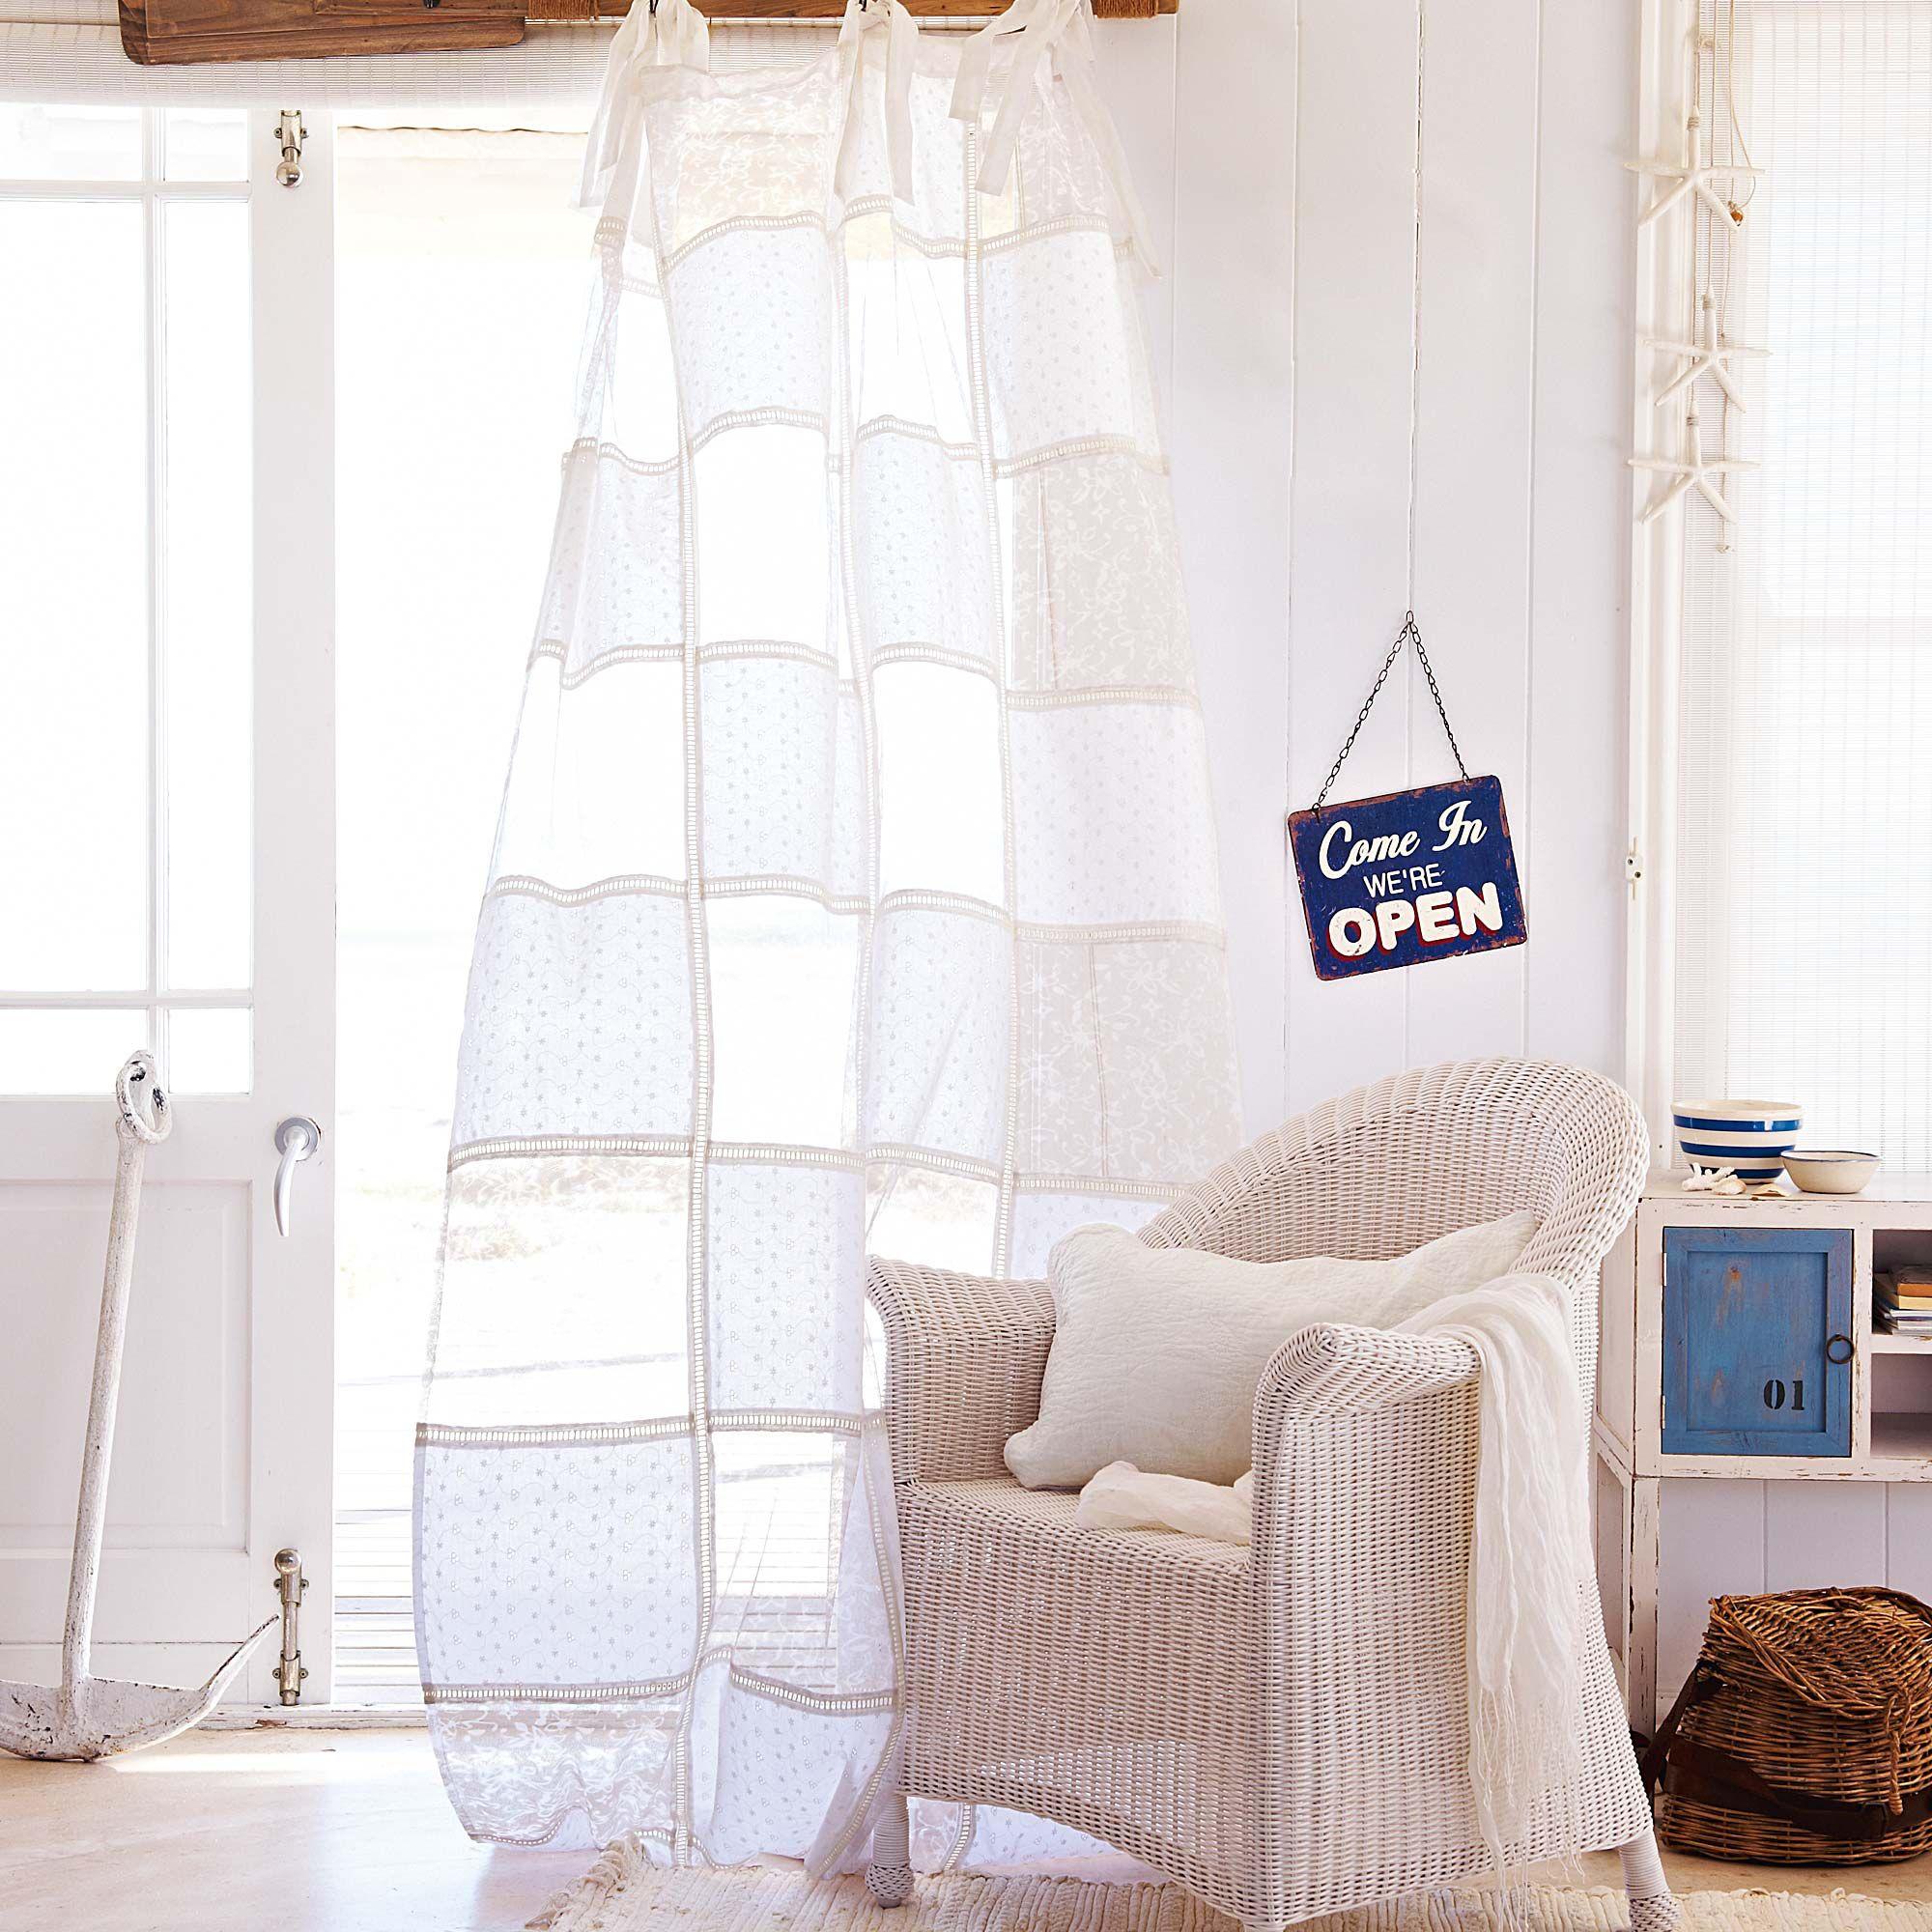 vorhang wei transparent best gardinen deko gardinen wei grau gestreift home mufbel wohnen. Black Bedroom Furniture Sets. Home Design Ideas